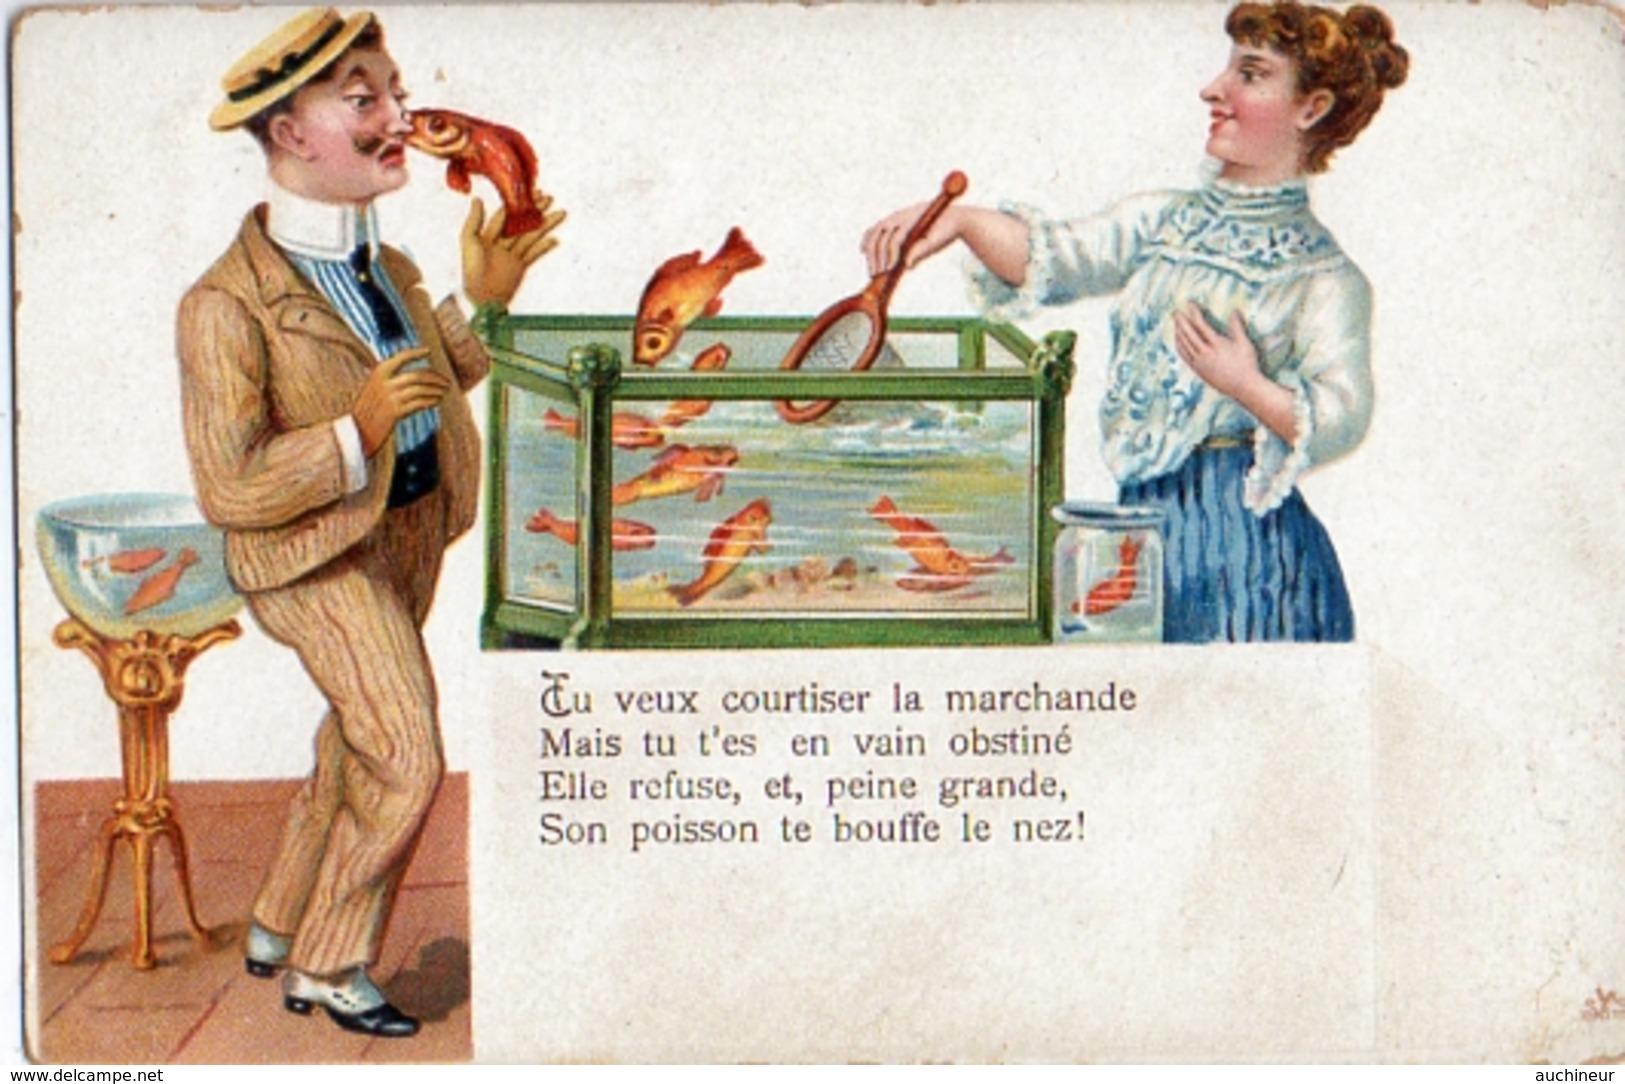 1er Avril 114, Humour Poisson Te Bouffe Le Nez - 1° Aprile (pesce Di Aprile)